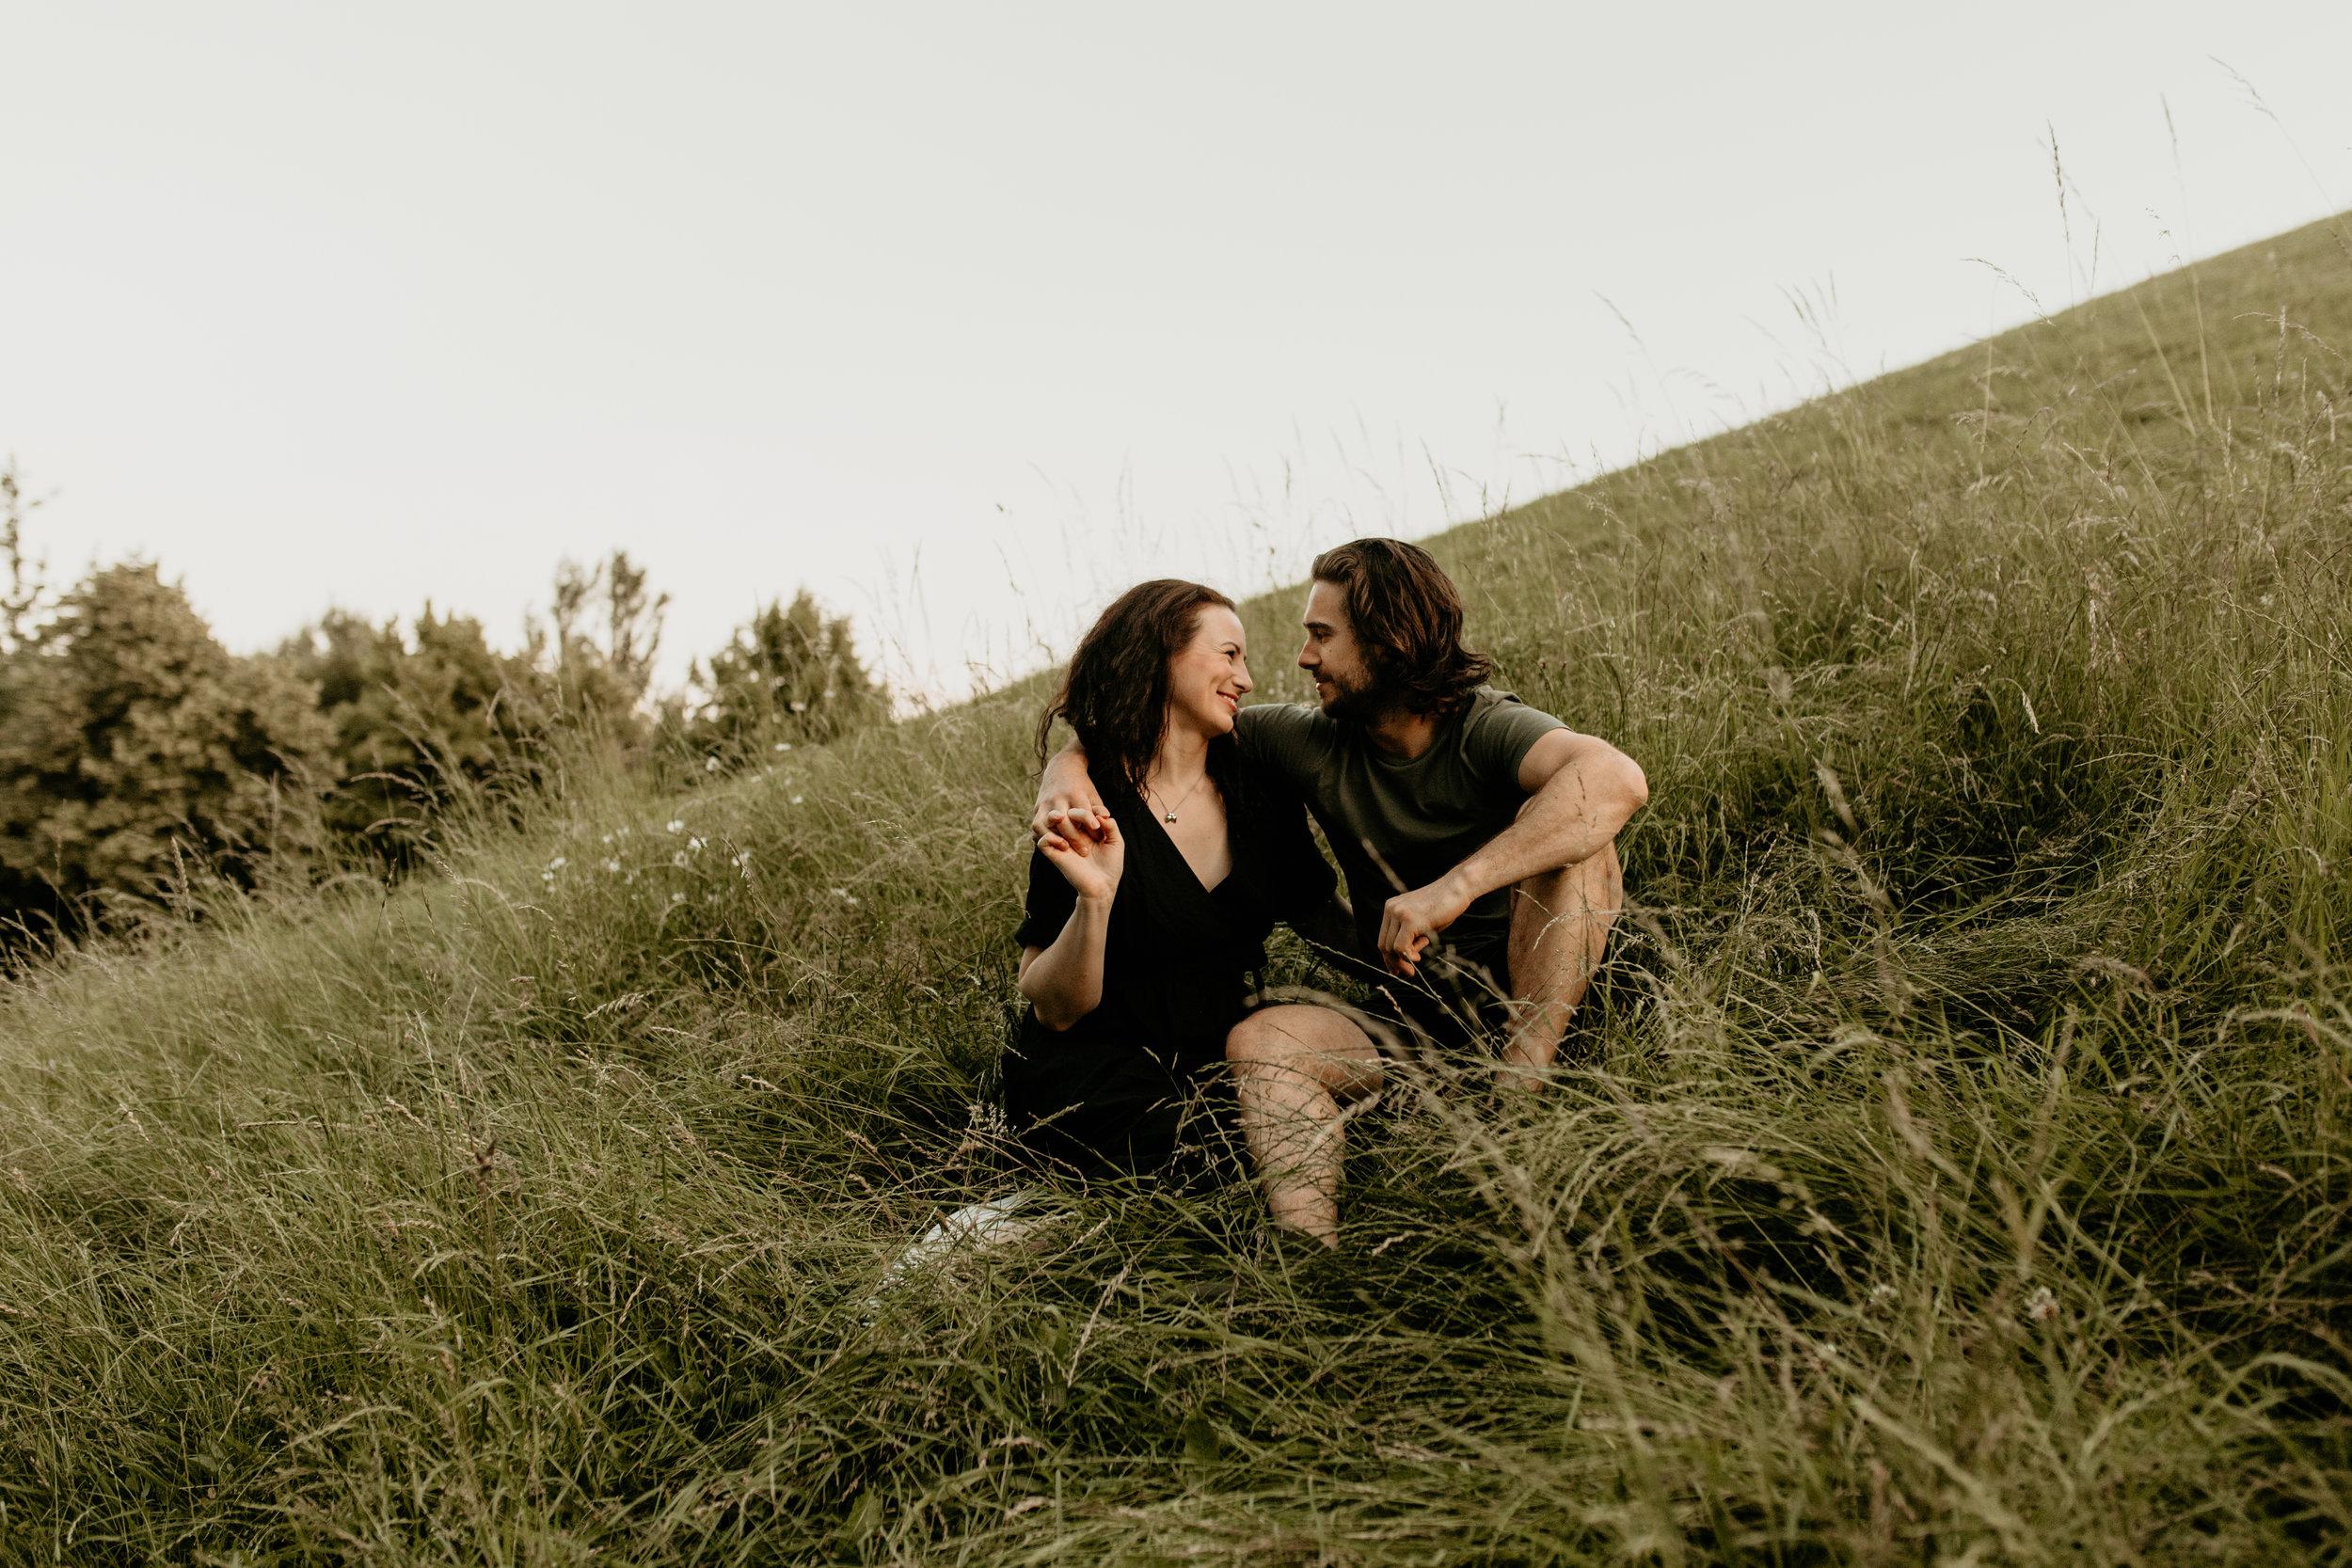 England-London-Photographer-Adventure-Couple-Golden-Hour-Sunset-20.jpg